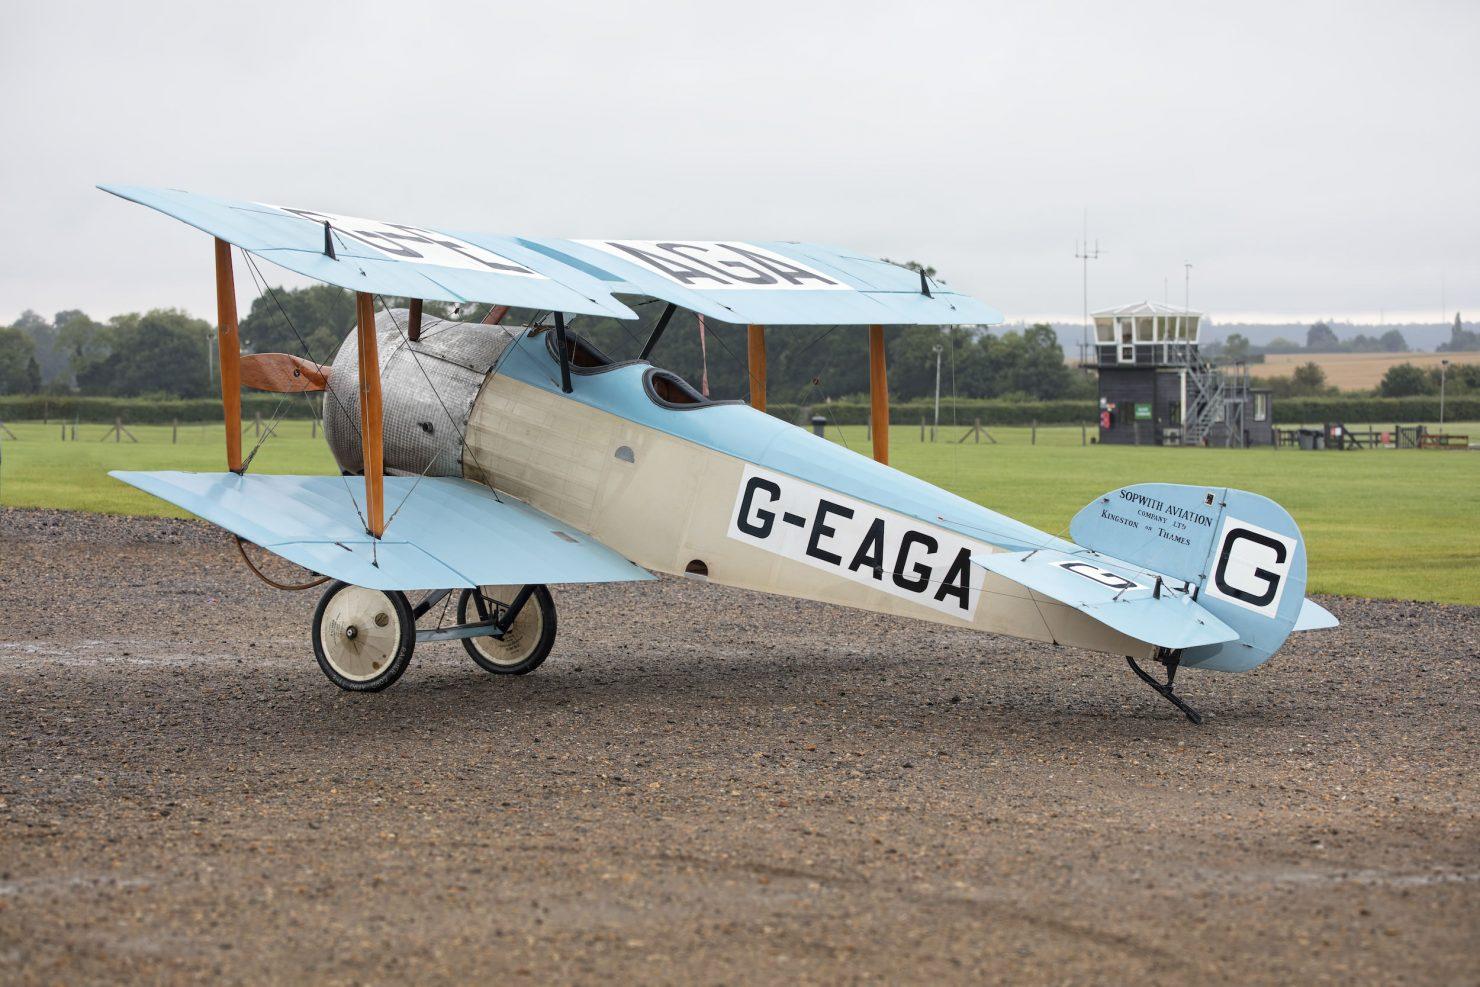 Sopwith Dove Two Seat Biplane 4 1480x987 - Sopwith Dove Biplane